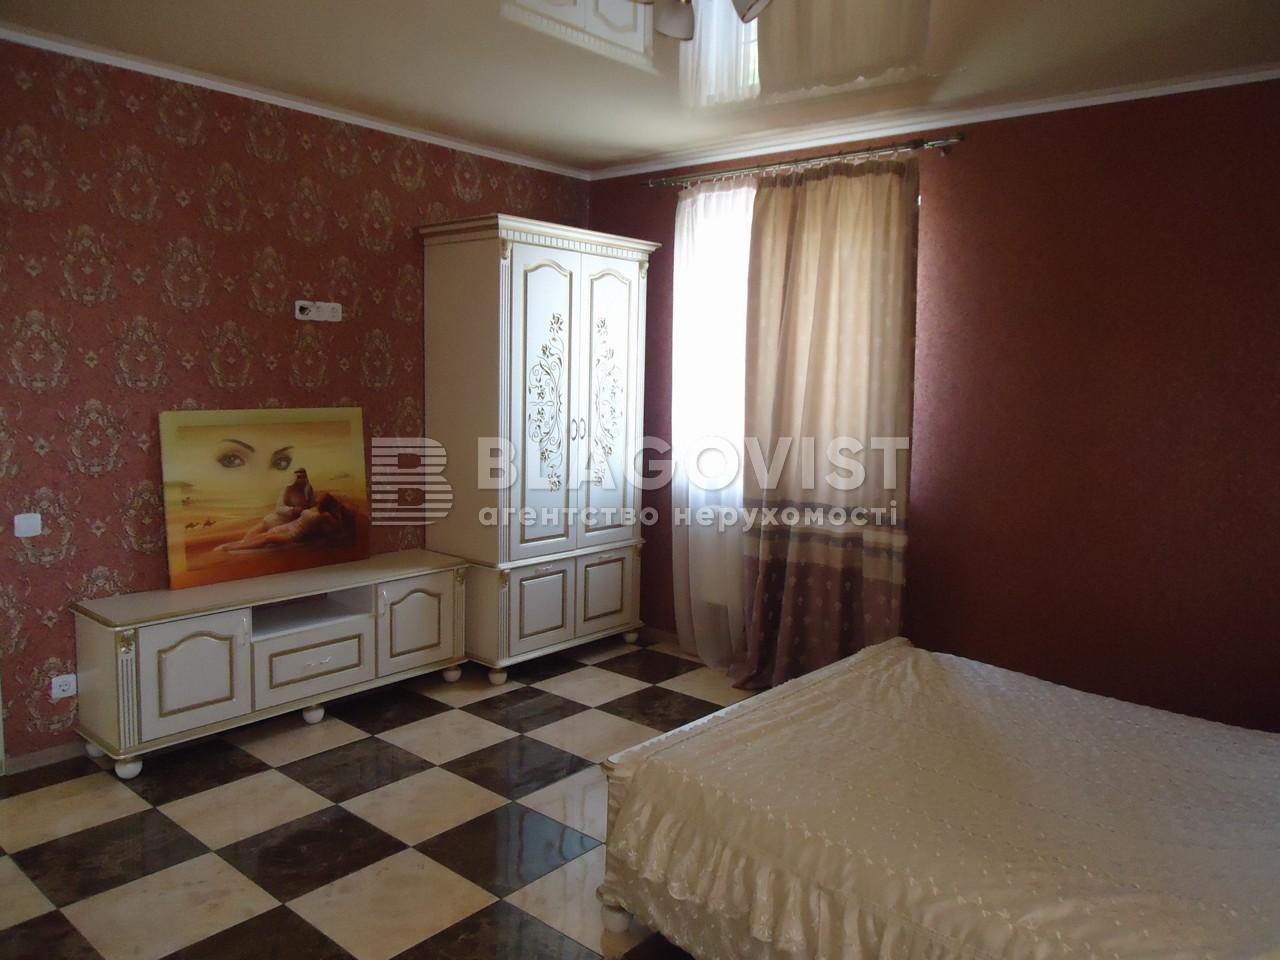 Дом M-35045, Бородавки, Гореничи - Фото 24